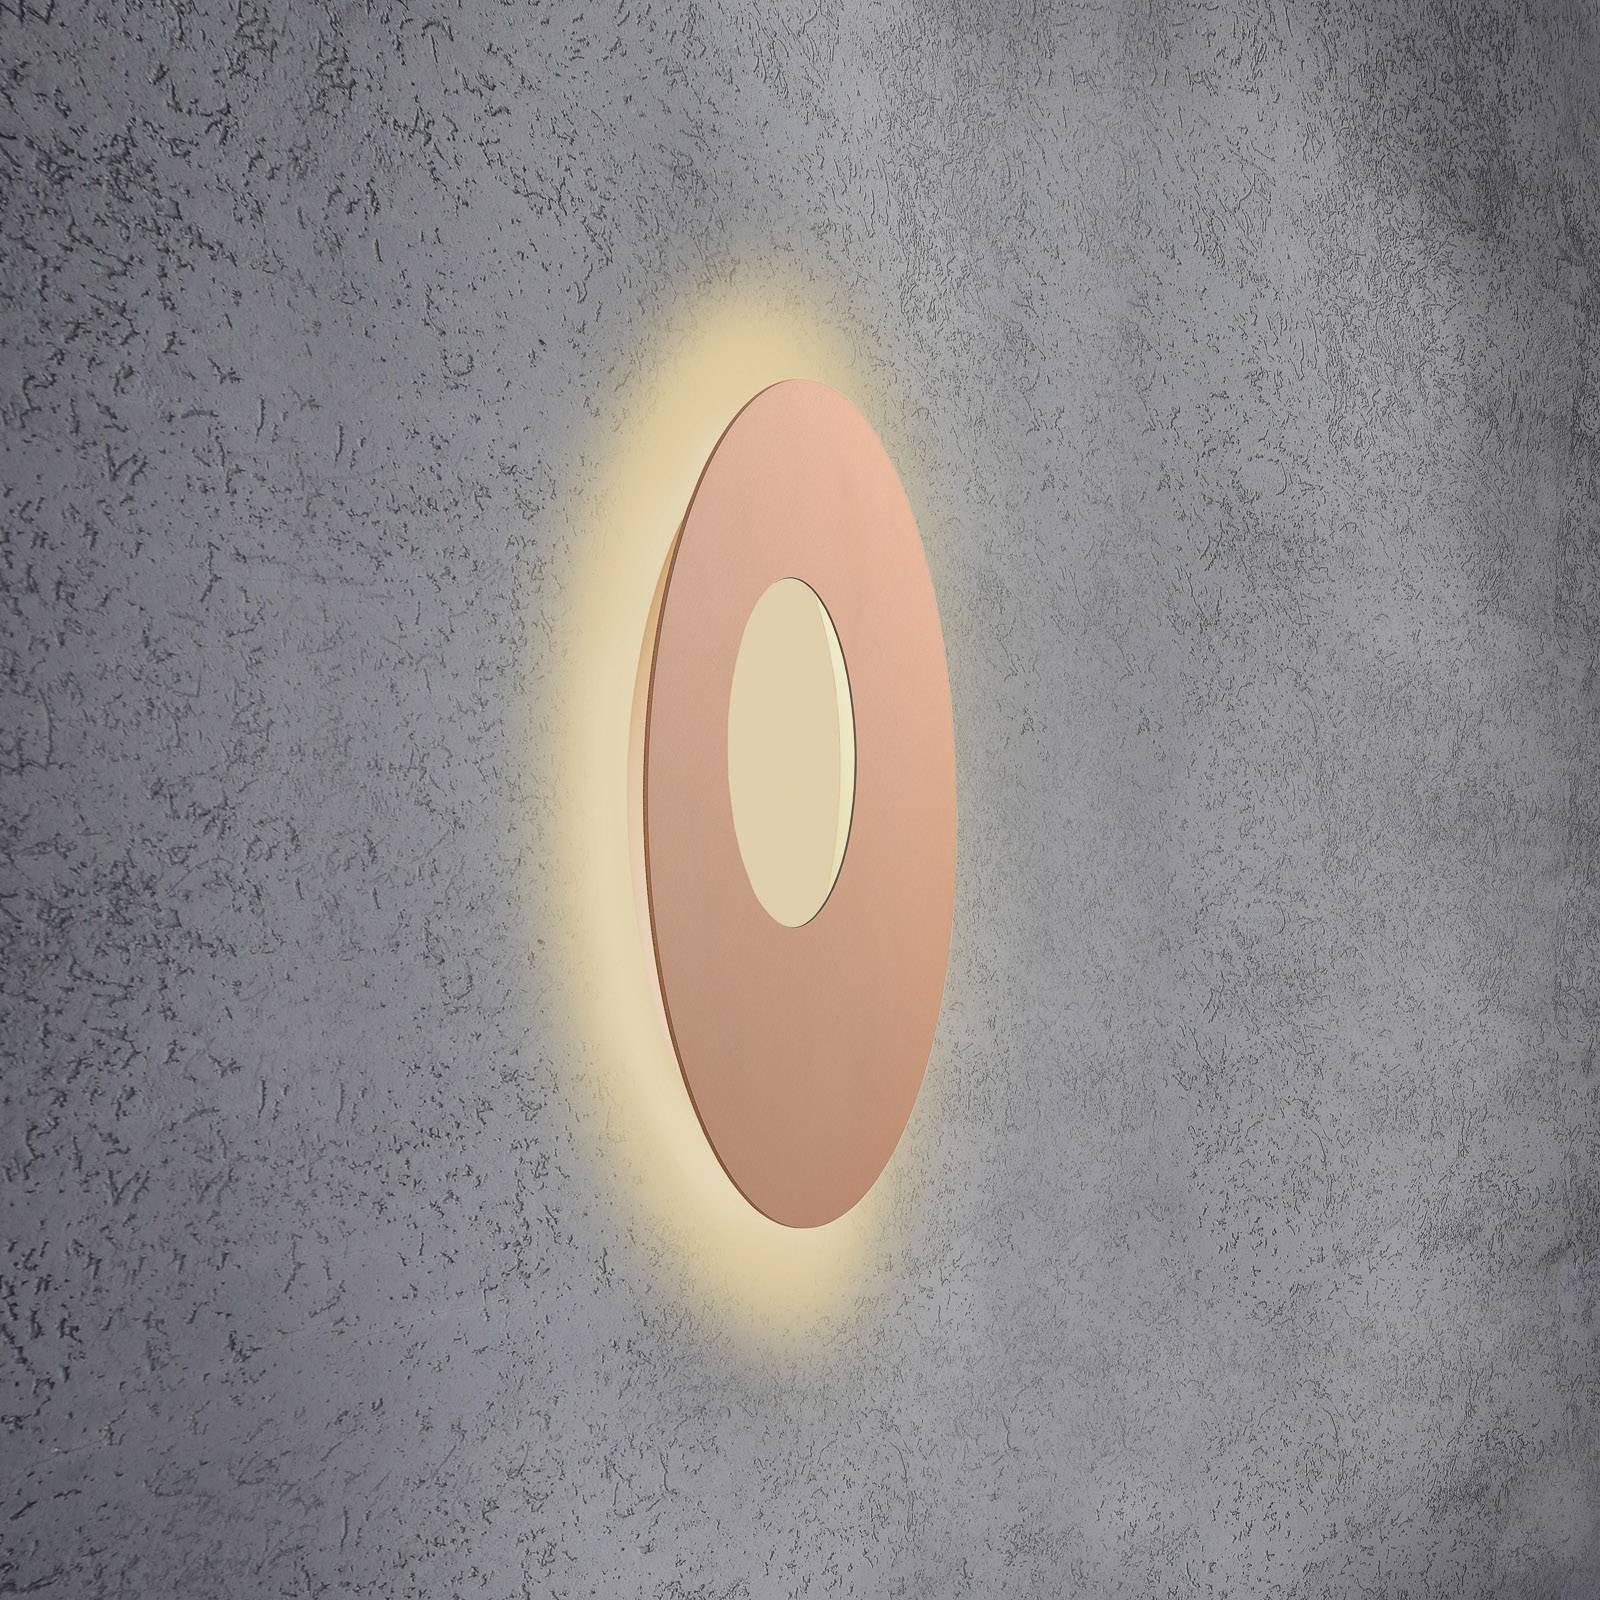 Escale Blade Open LED-vegglampe, rosé, Ø 59 cm